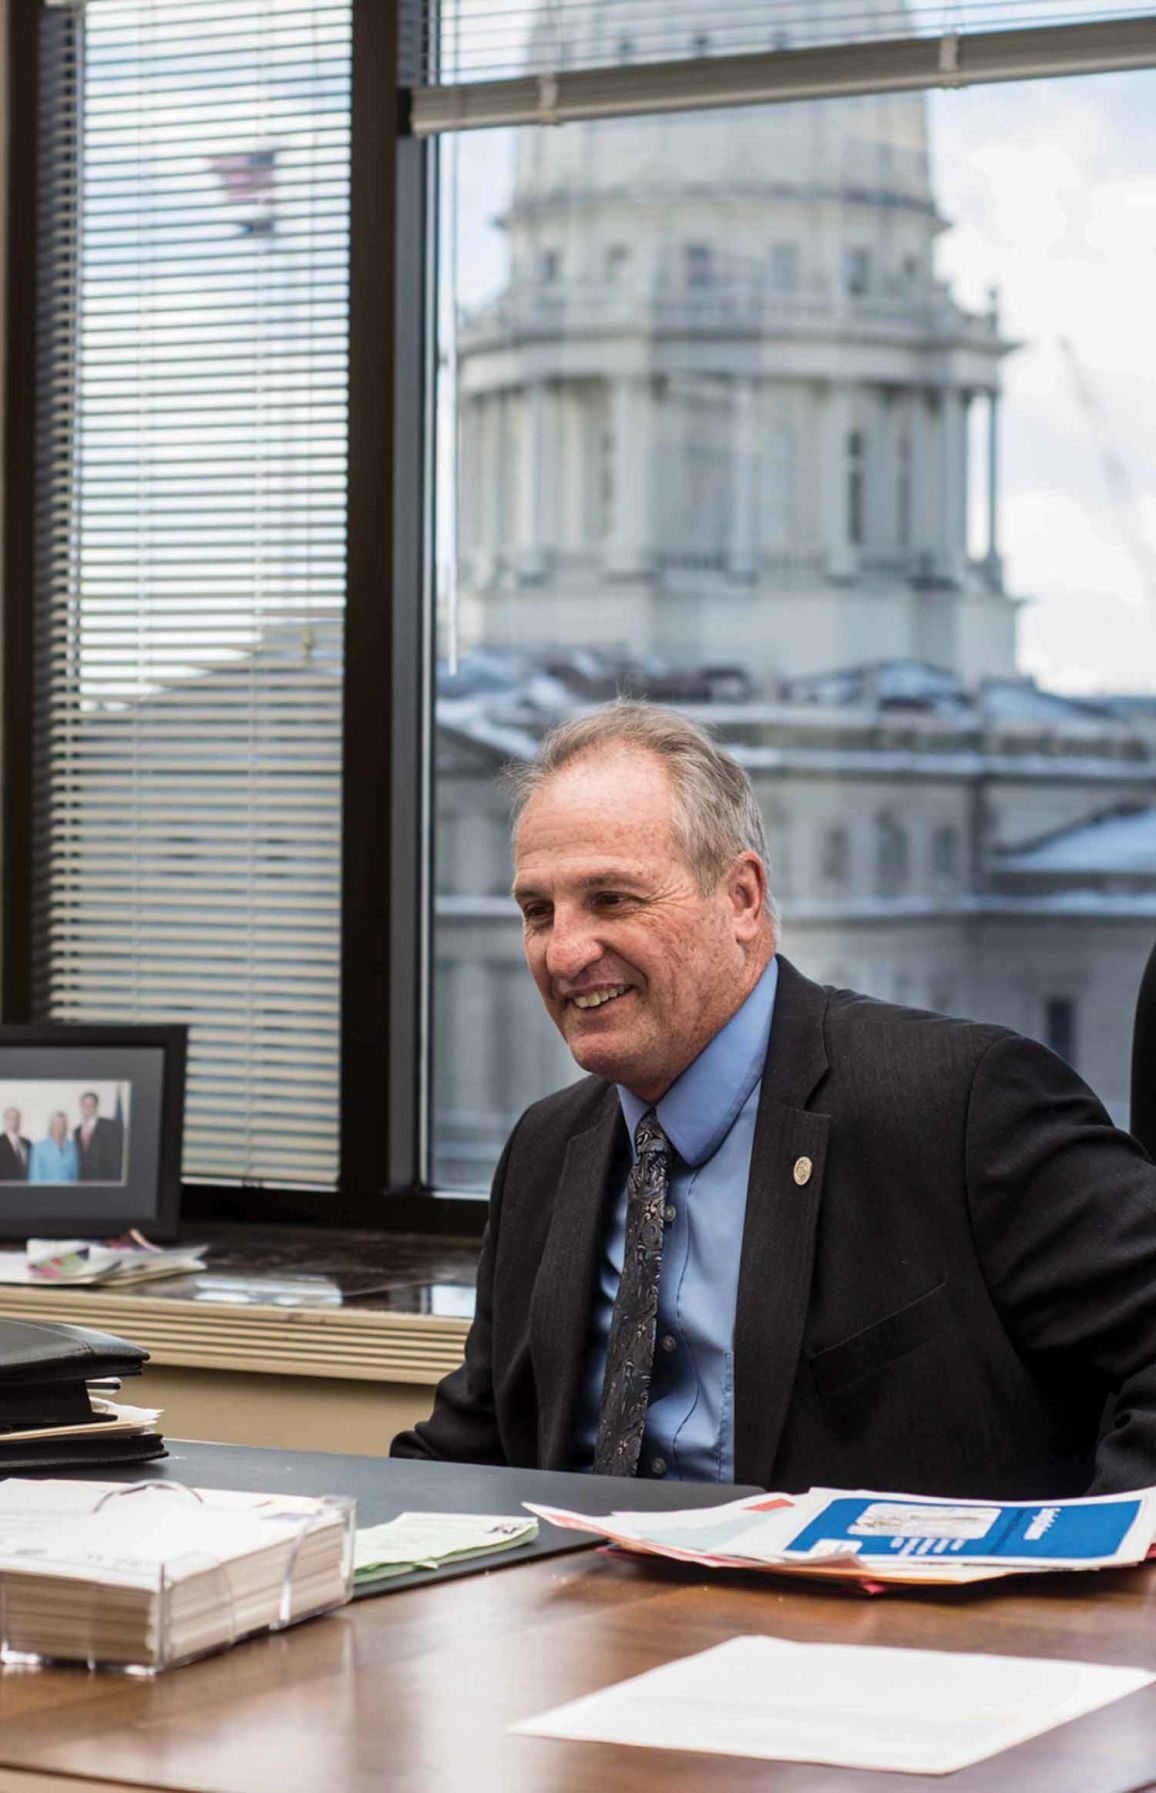 12-4 term limits_Joe Graves1C_FILE PHOTO.jpg